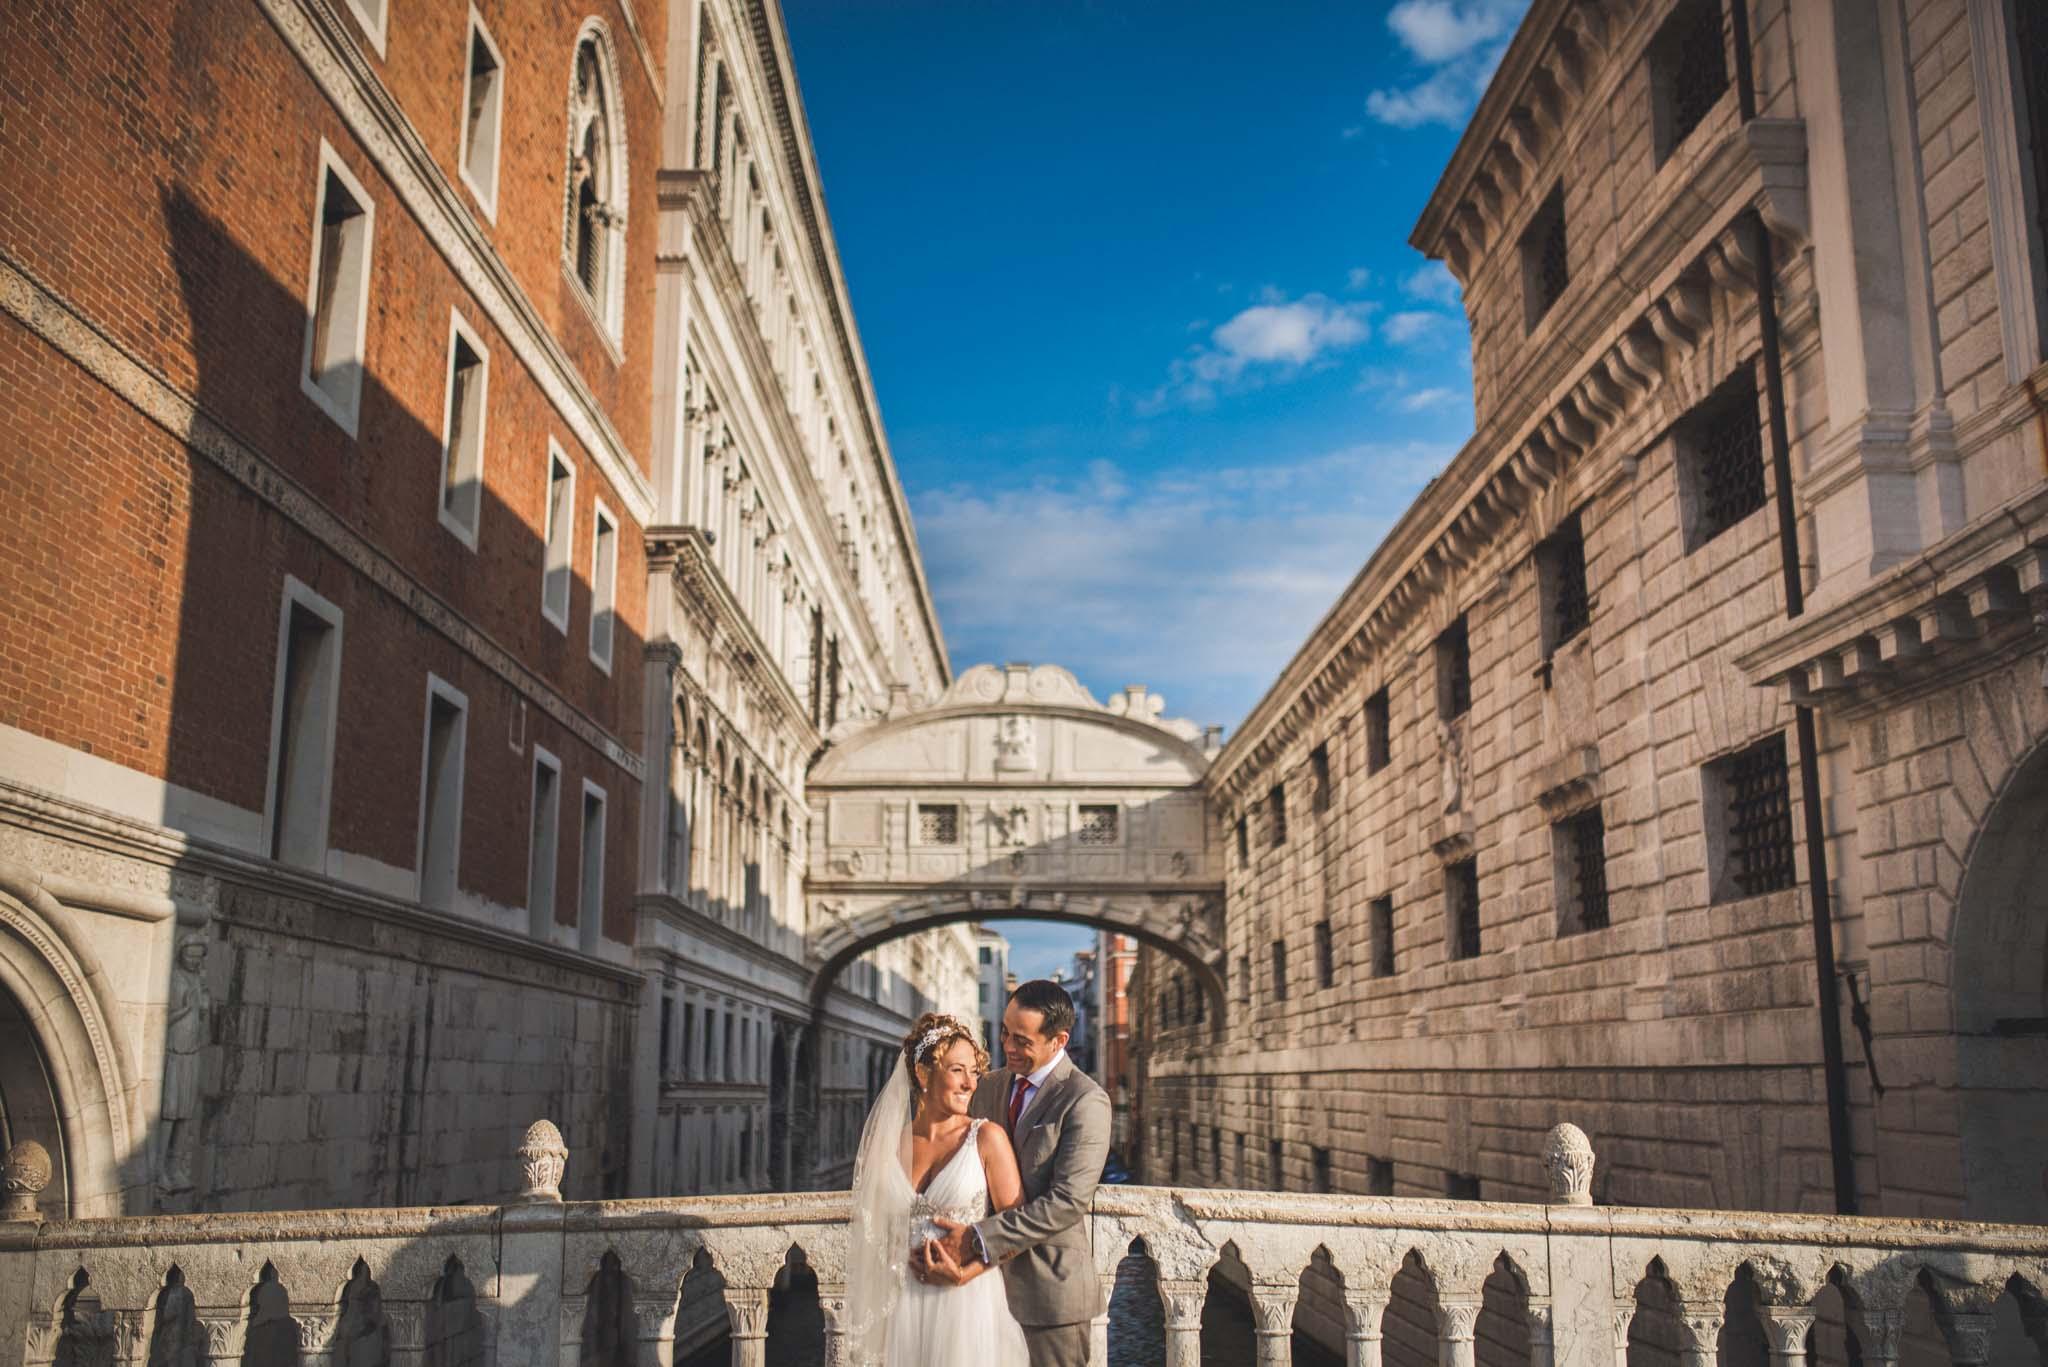 wedding-in-venice-roberto-panciatici-photography-4